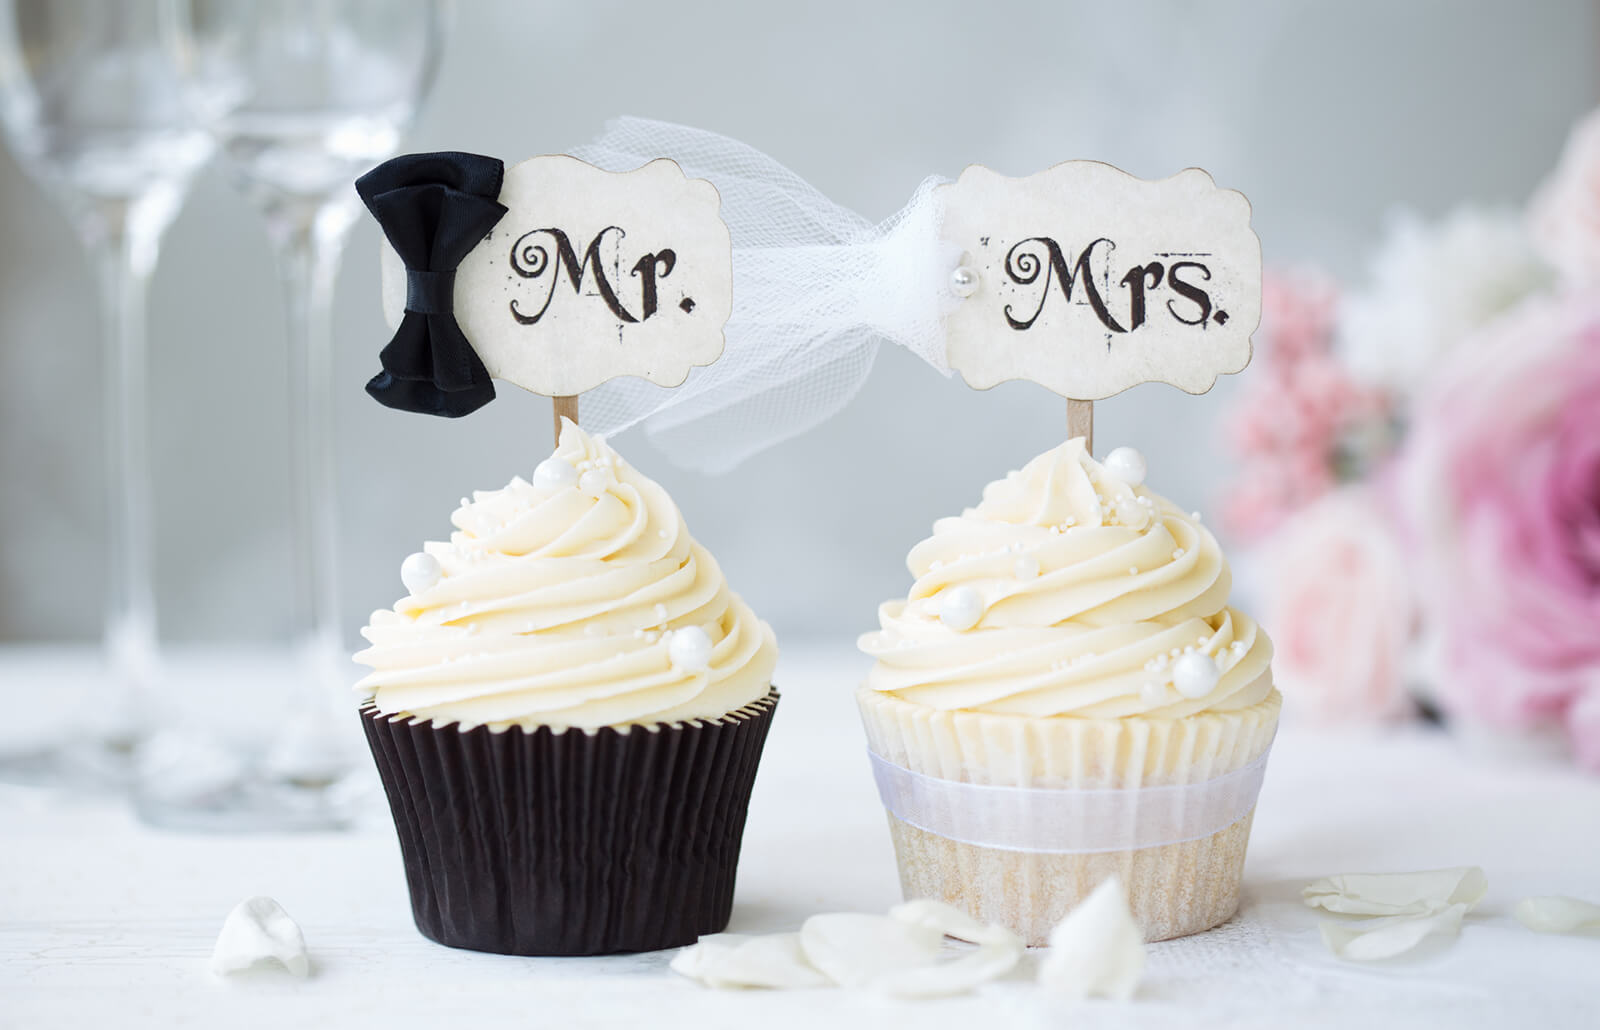 23 Wedding Cupcake Ideas Slideshow For Any Wedding Lovetoknow